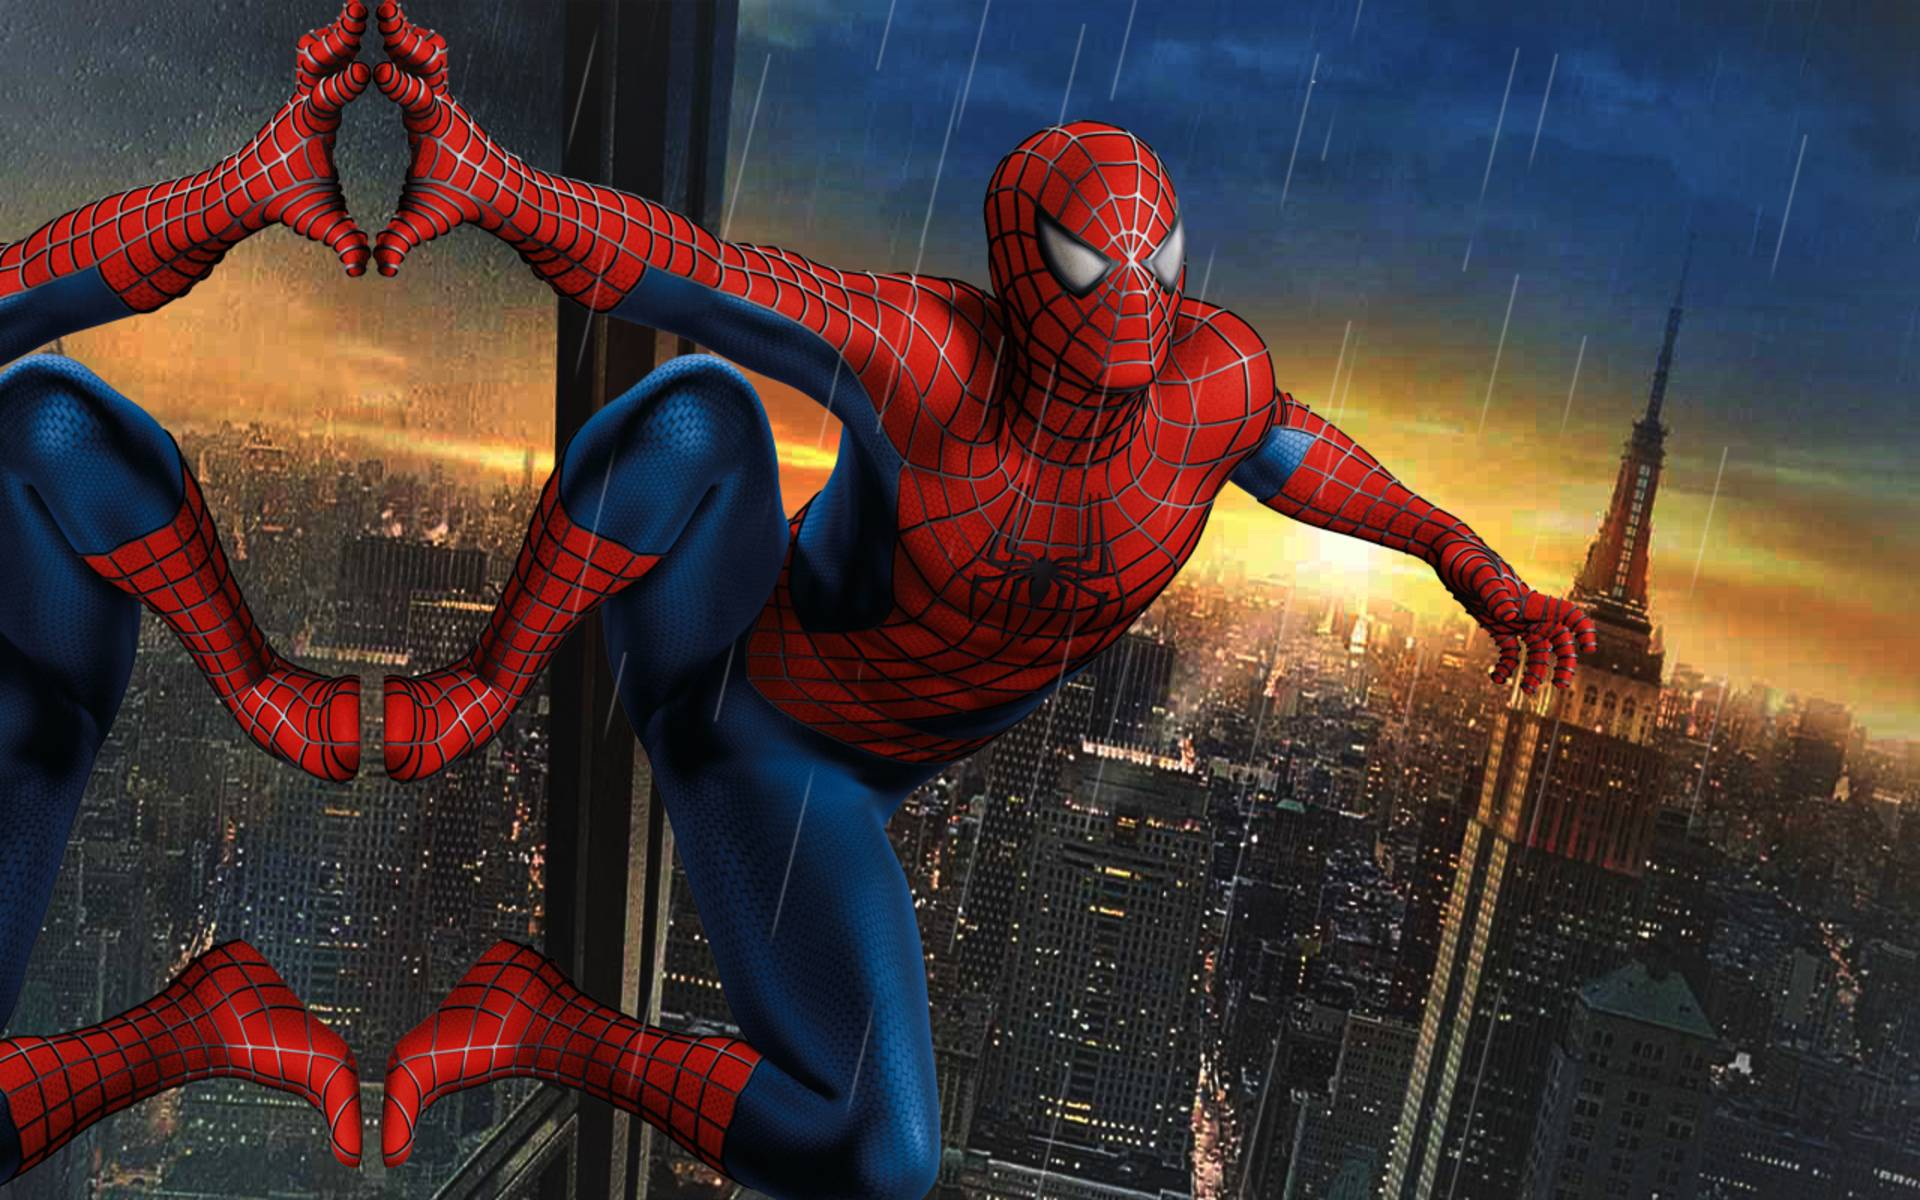 Hd wallpaper spiderman - 1379042 Jpg